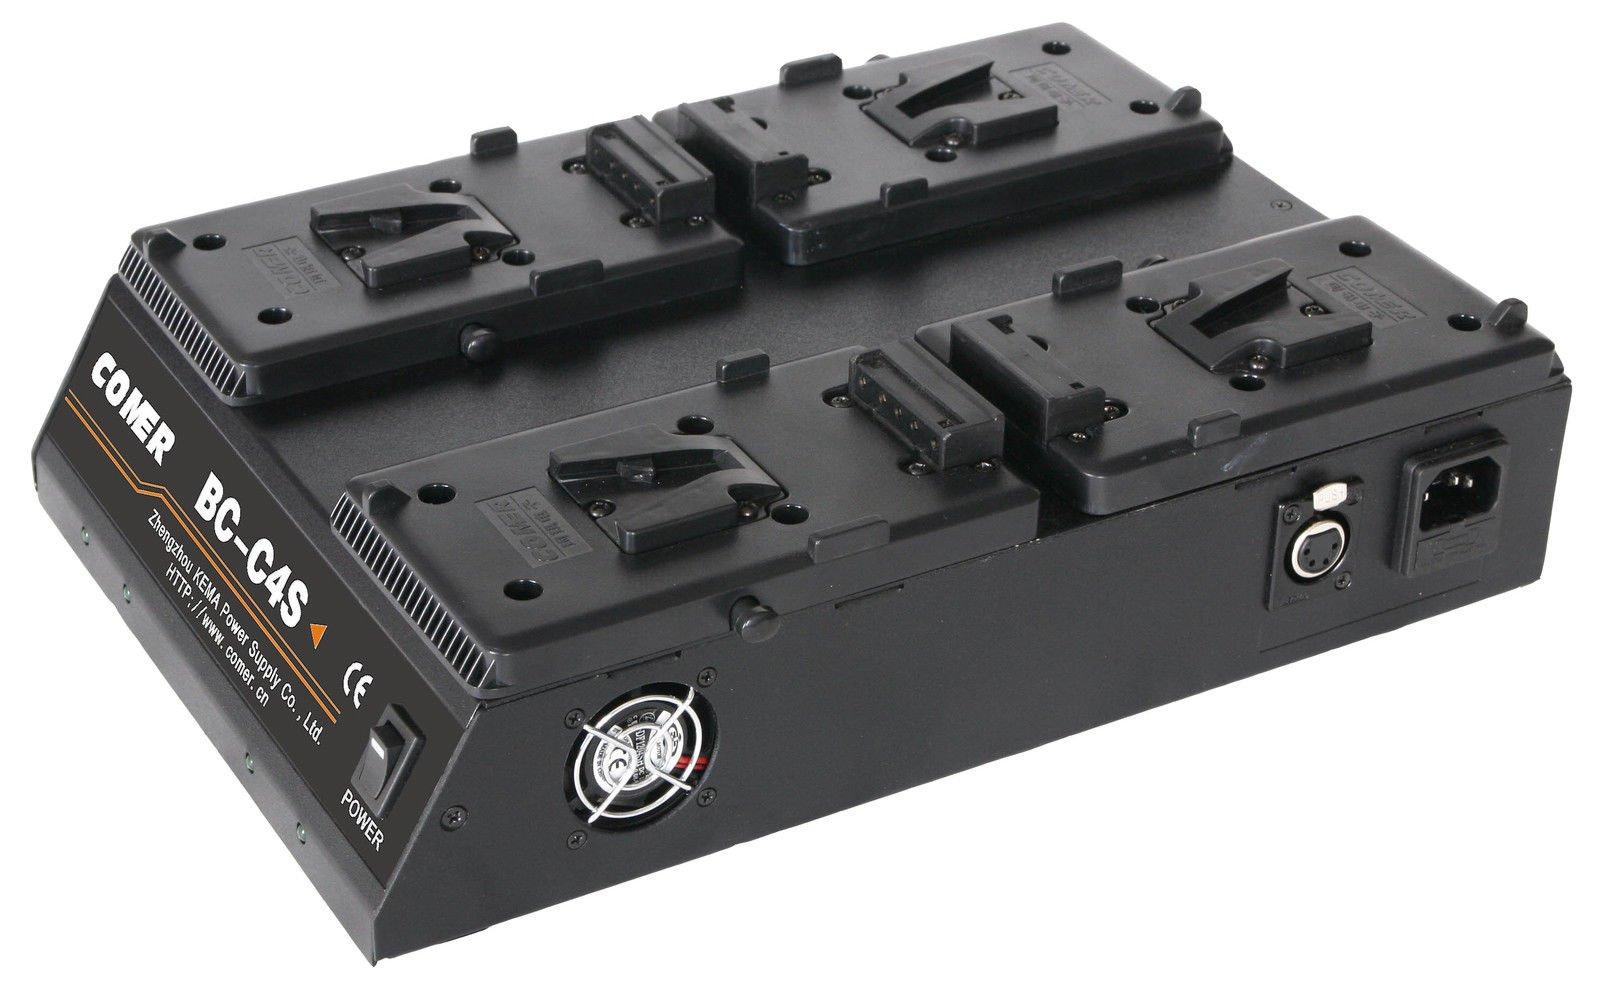 Quad 4-Channel V-Mount/V Lock Battery Charger with 16.8V Power Supply Output